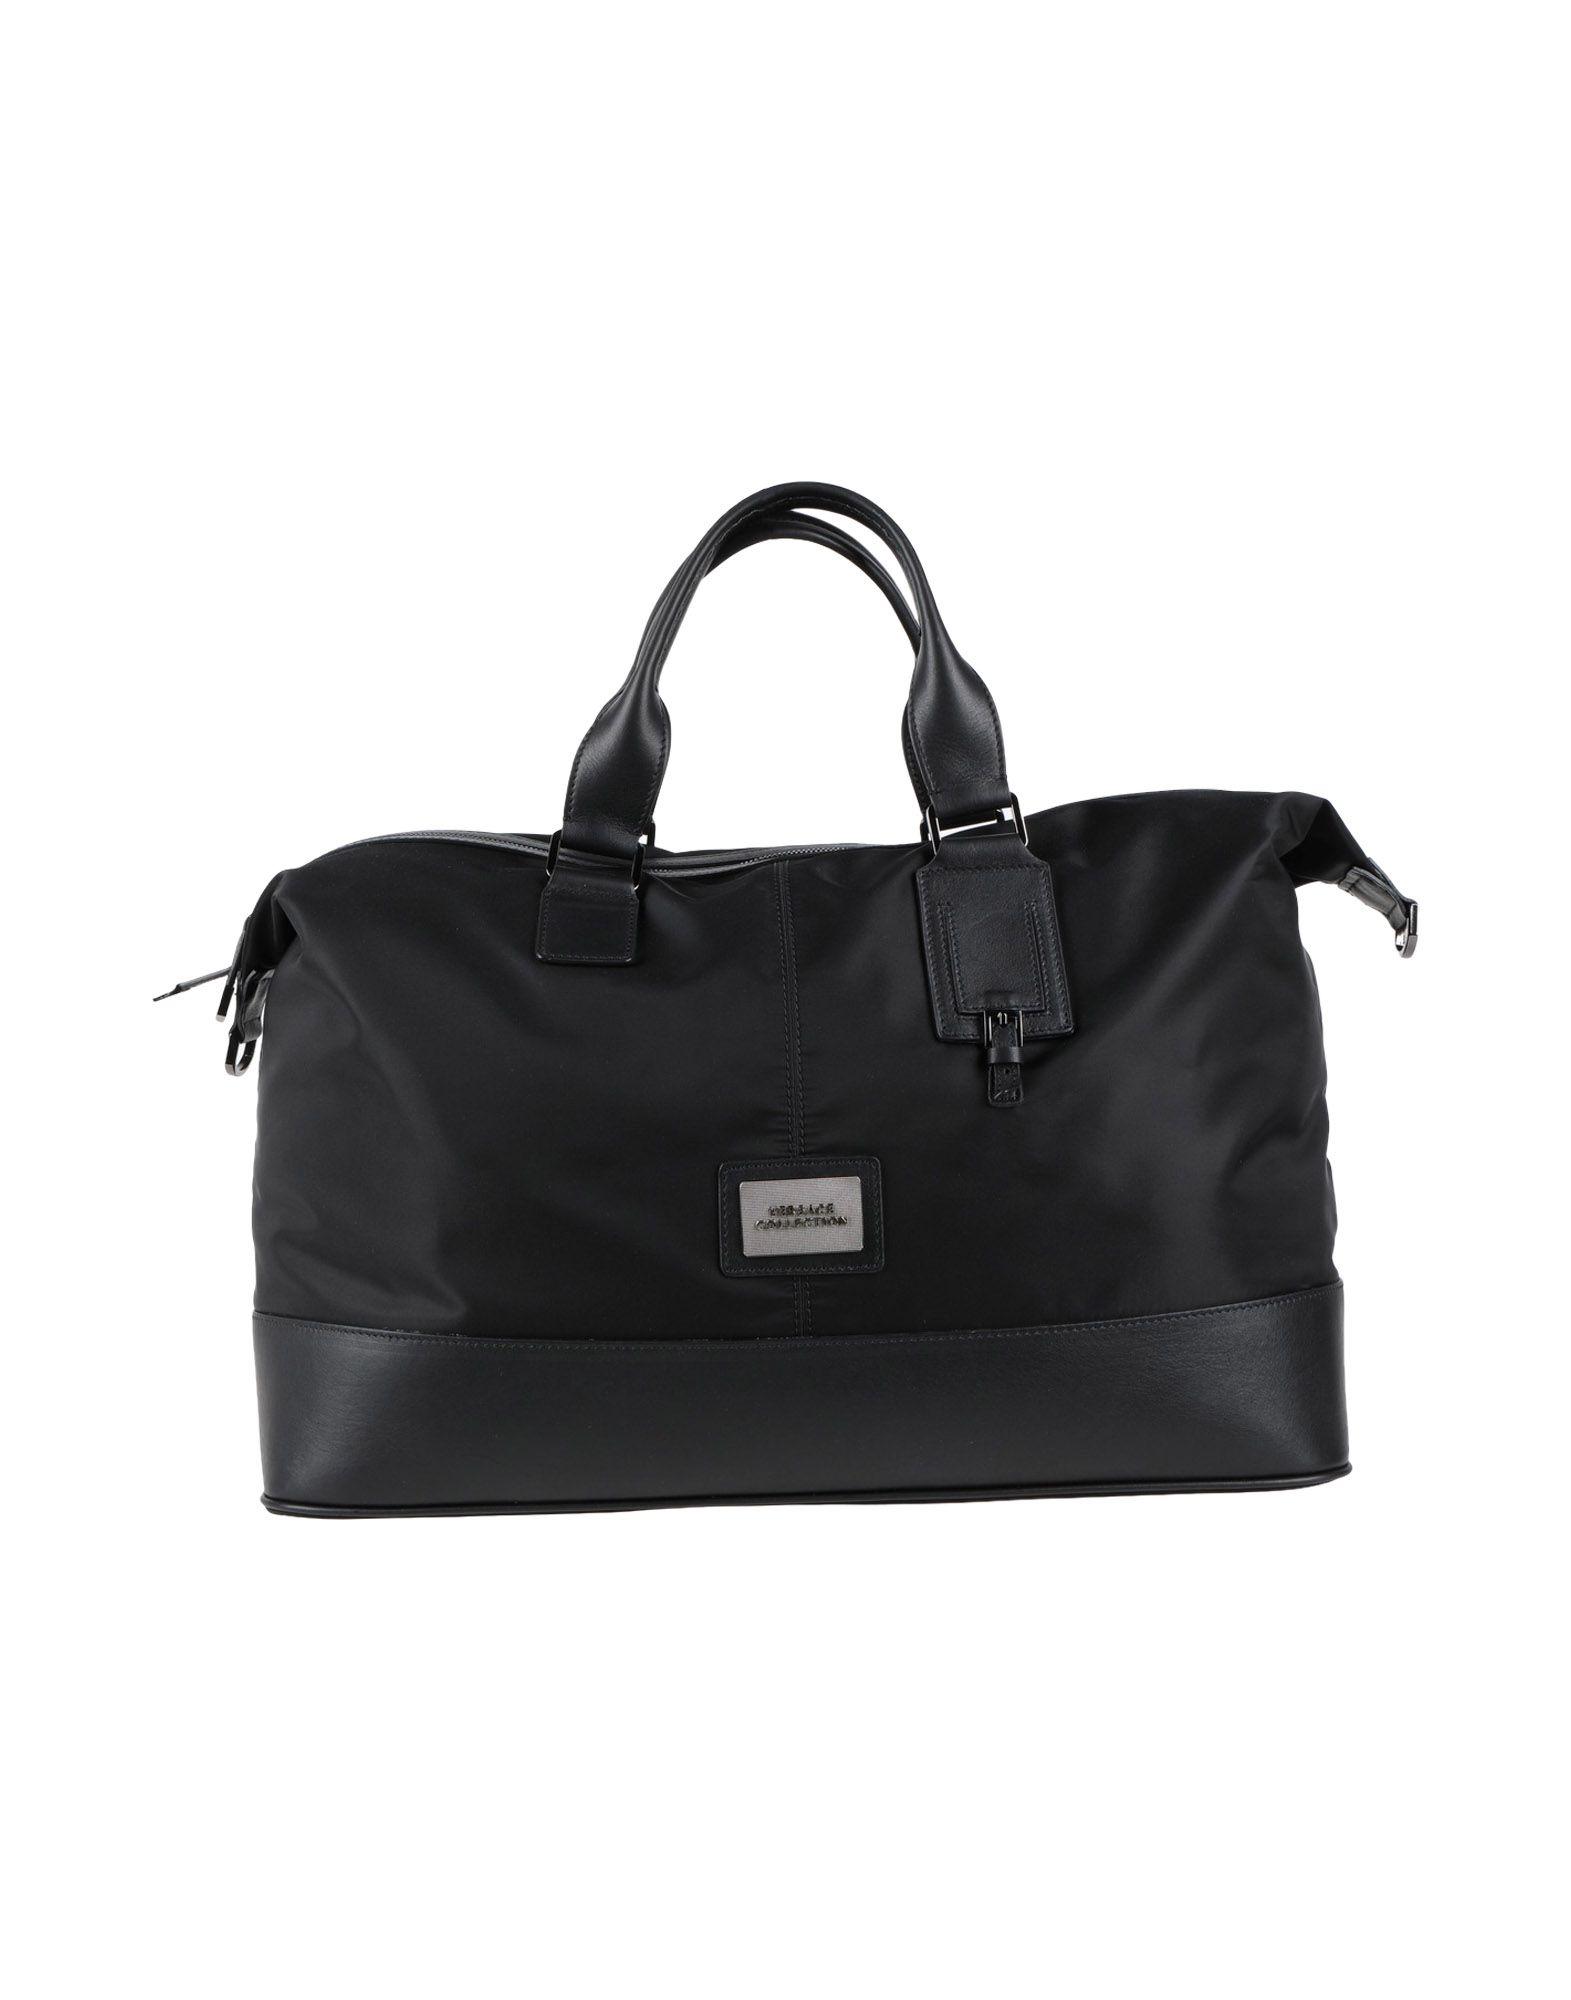 Versace Travel Travel & duffel bag